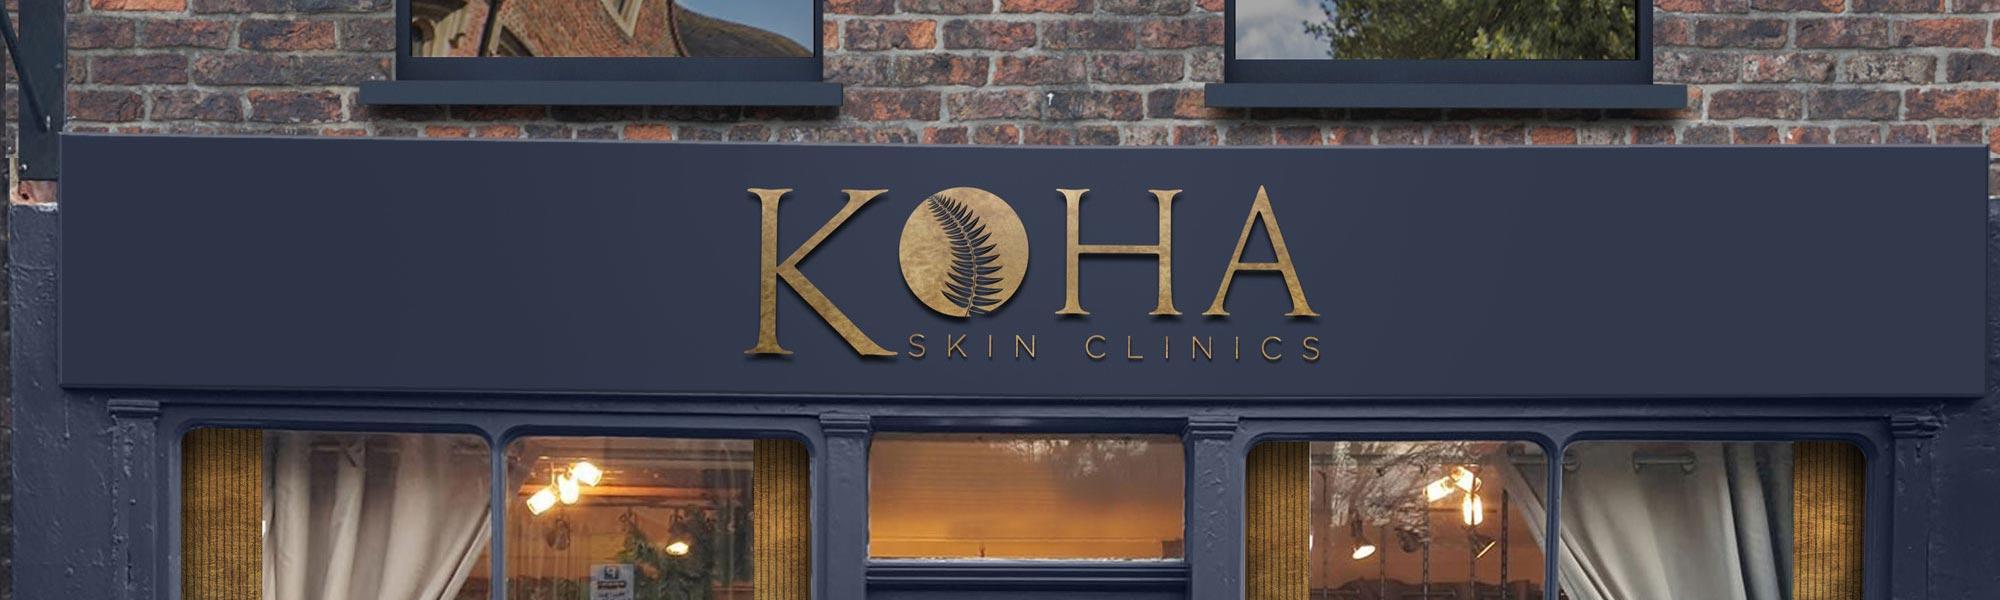 Koha Skin Clinic Berkhamsted Page Feature Header Image